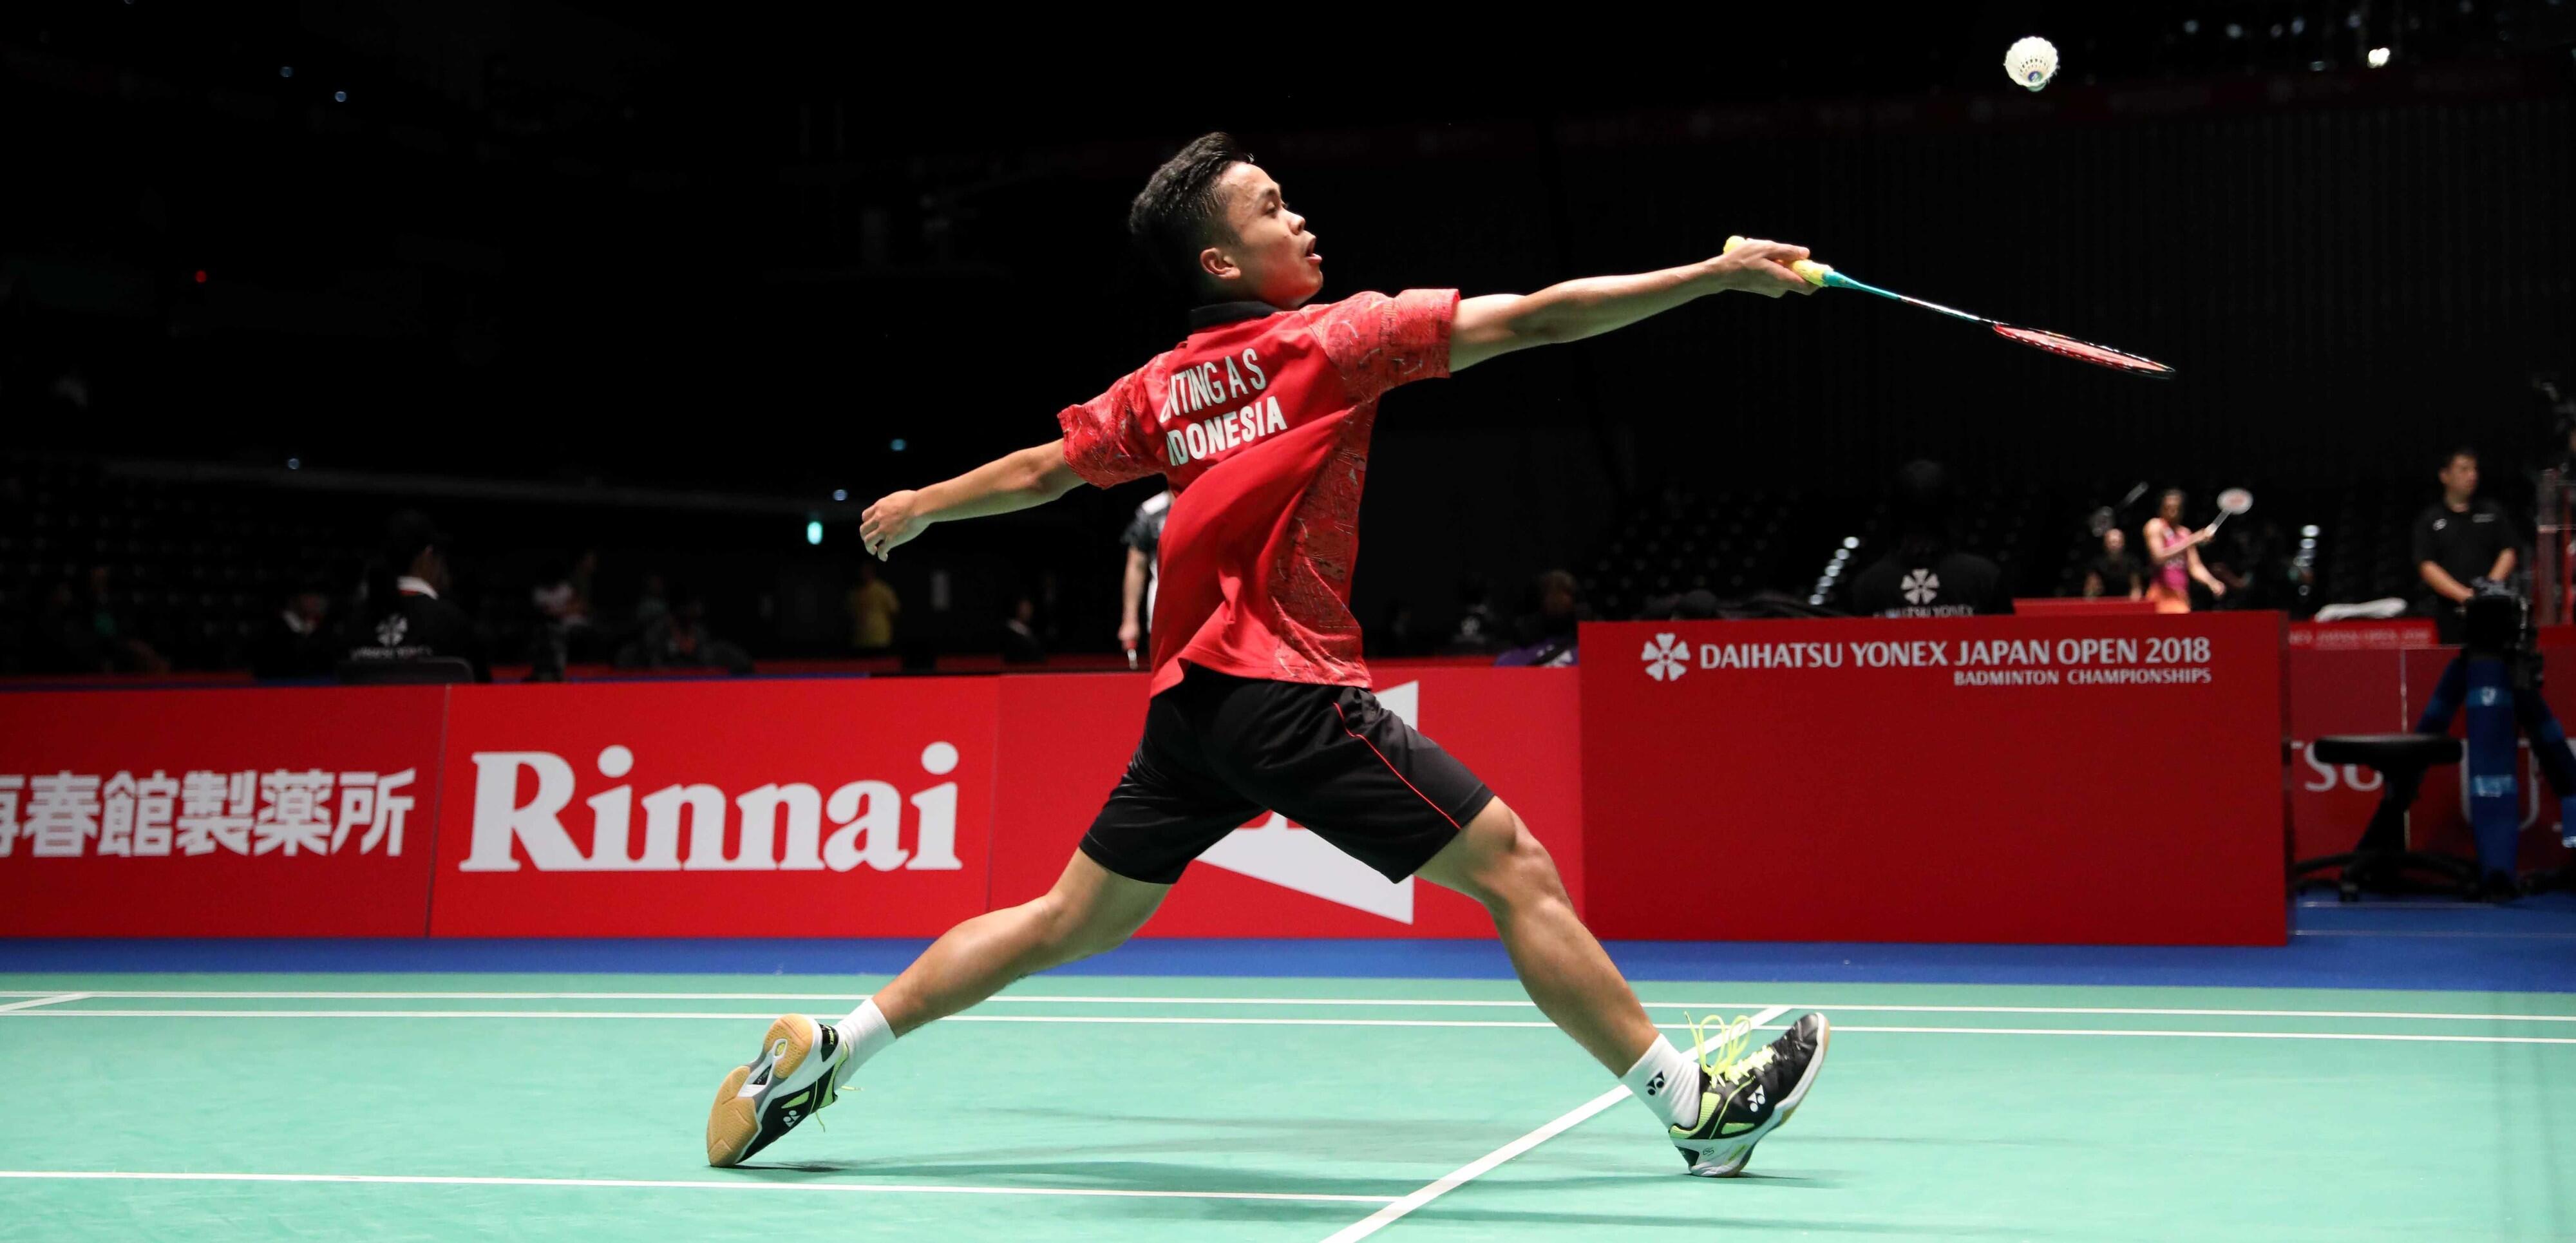 Japan Open 2018: Anthony Ginting Lolos, Jonatan Christie Tersingkir